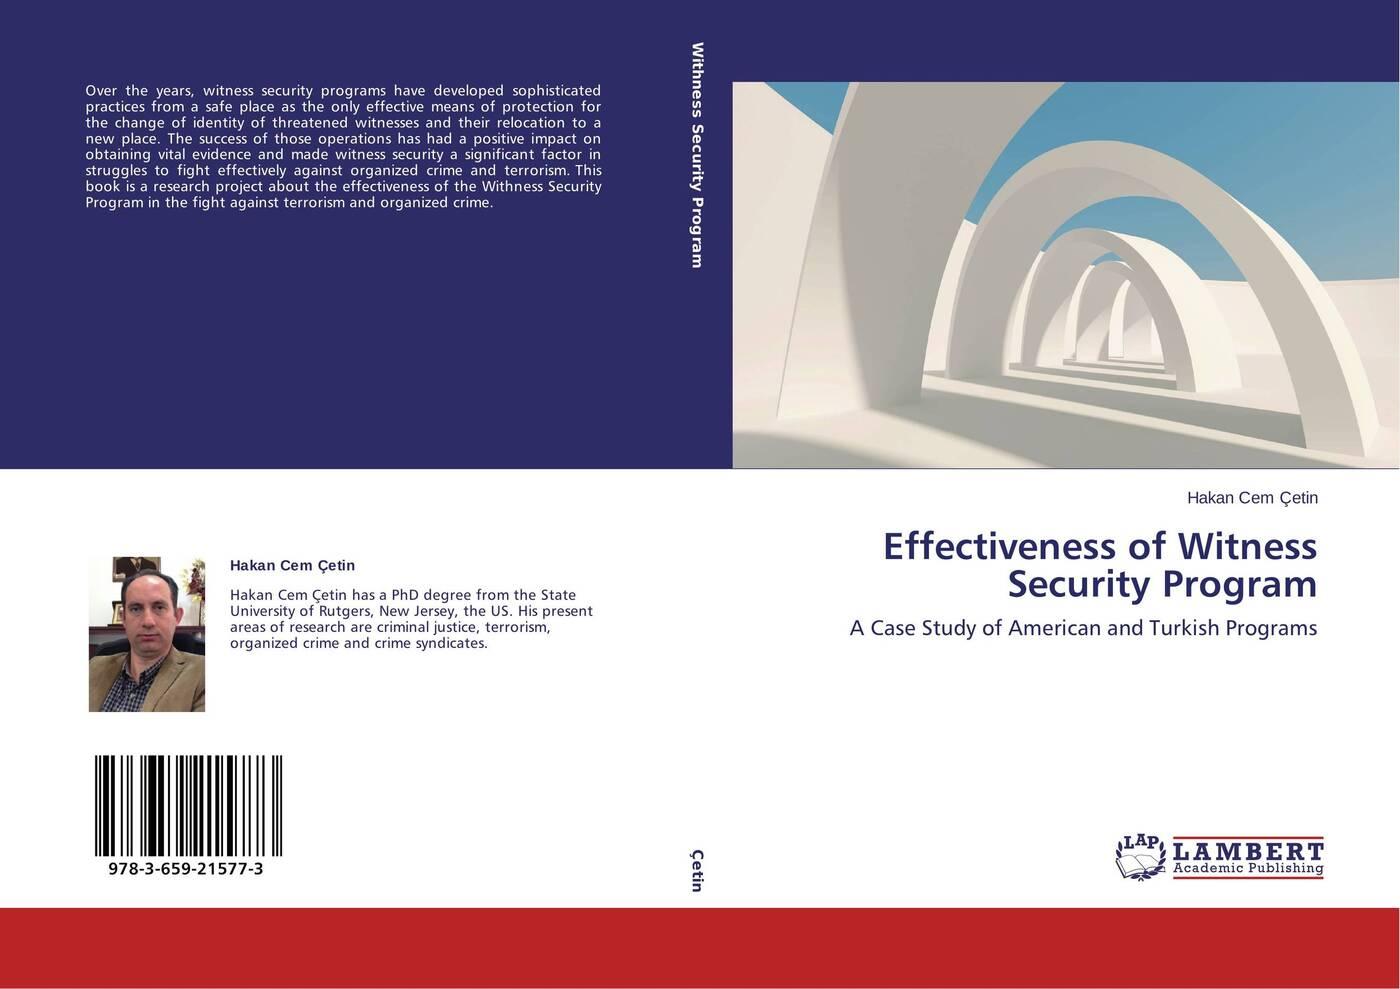 Hakan Cem Çetin Effectiveness of Witness Security Program effectiveness of witness security program